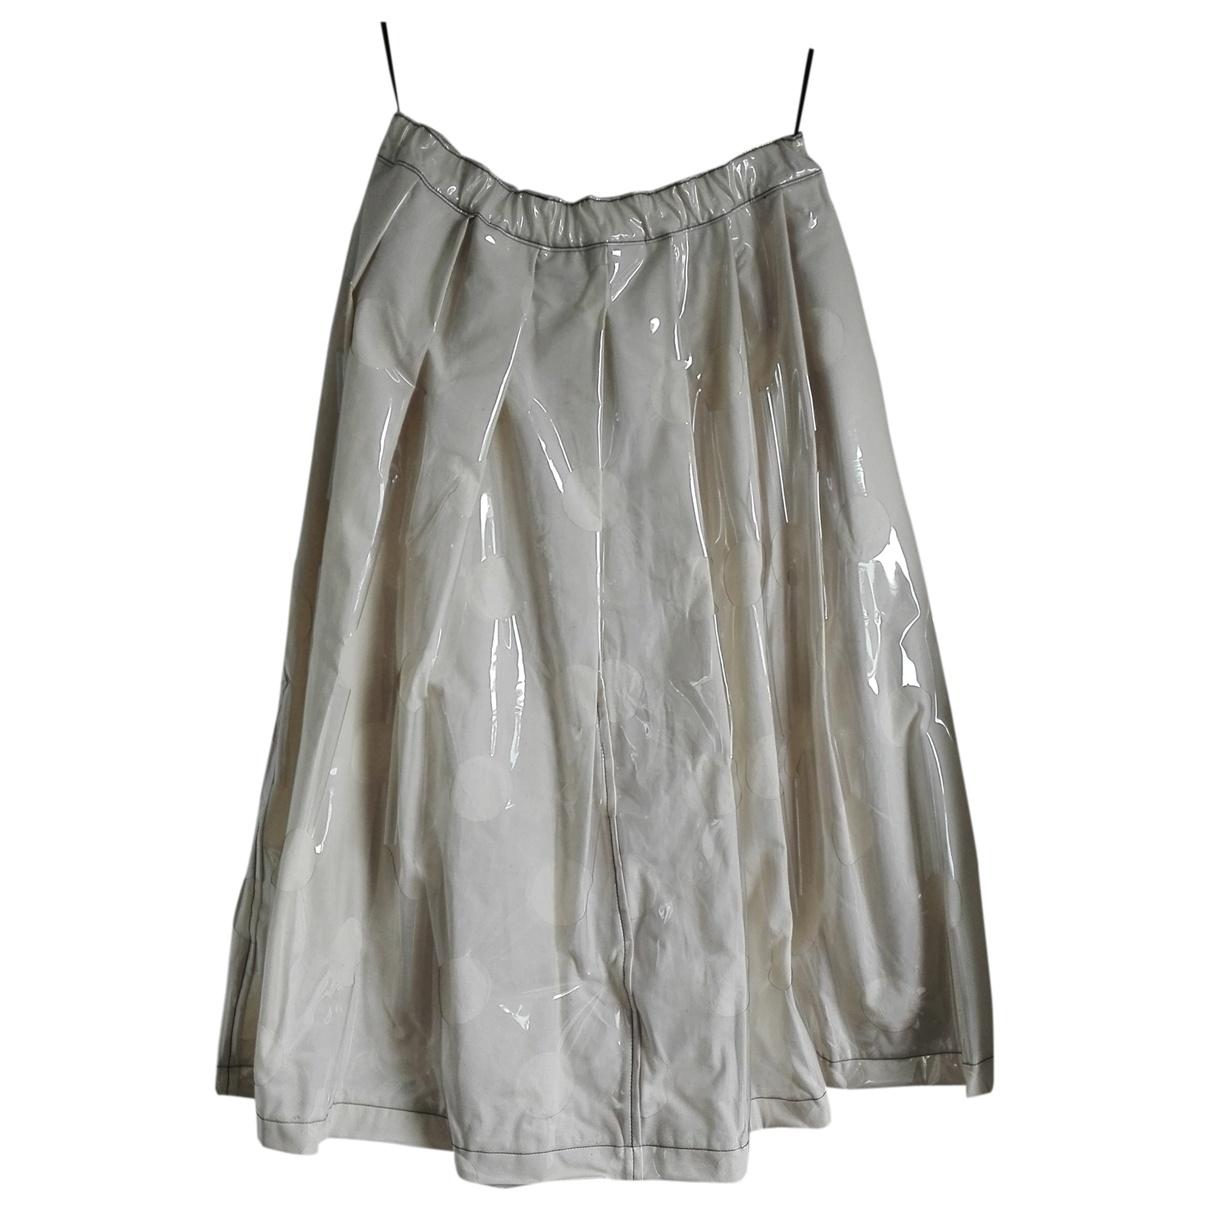 Comme Des Garcons \N Ecru Cotton skirt for Women S International